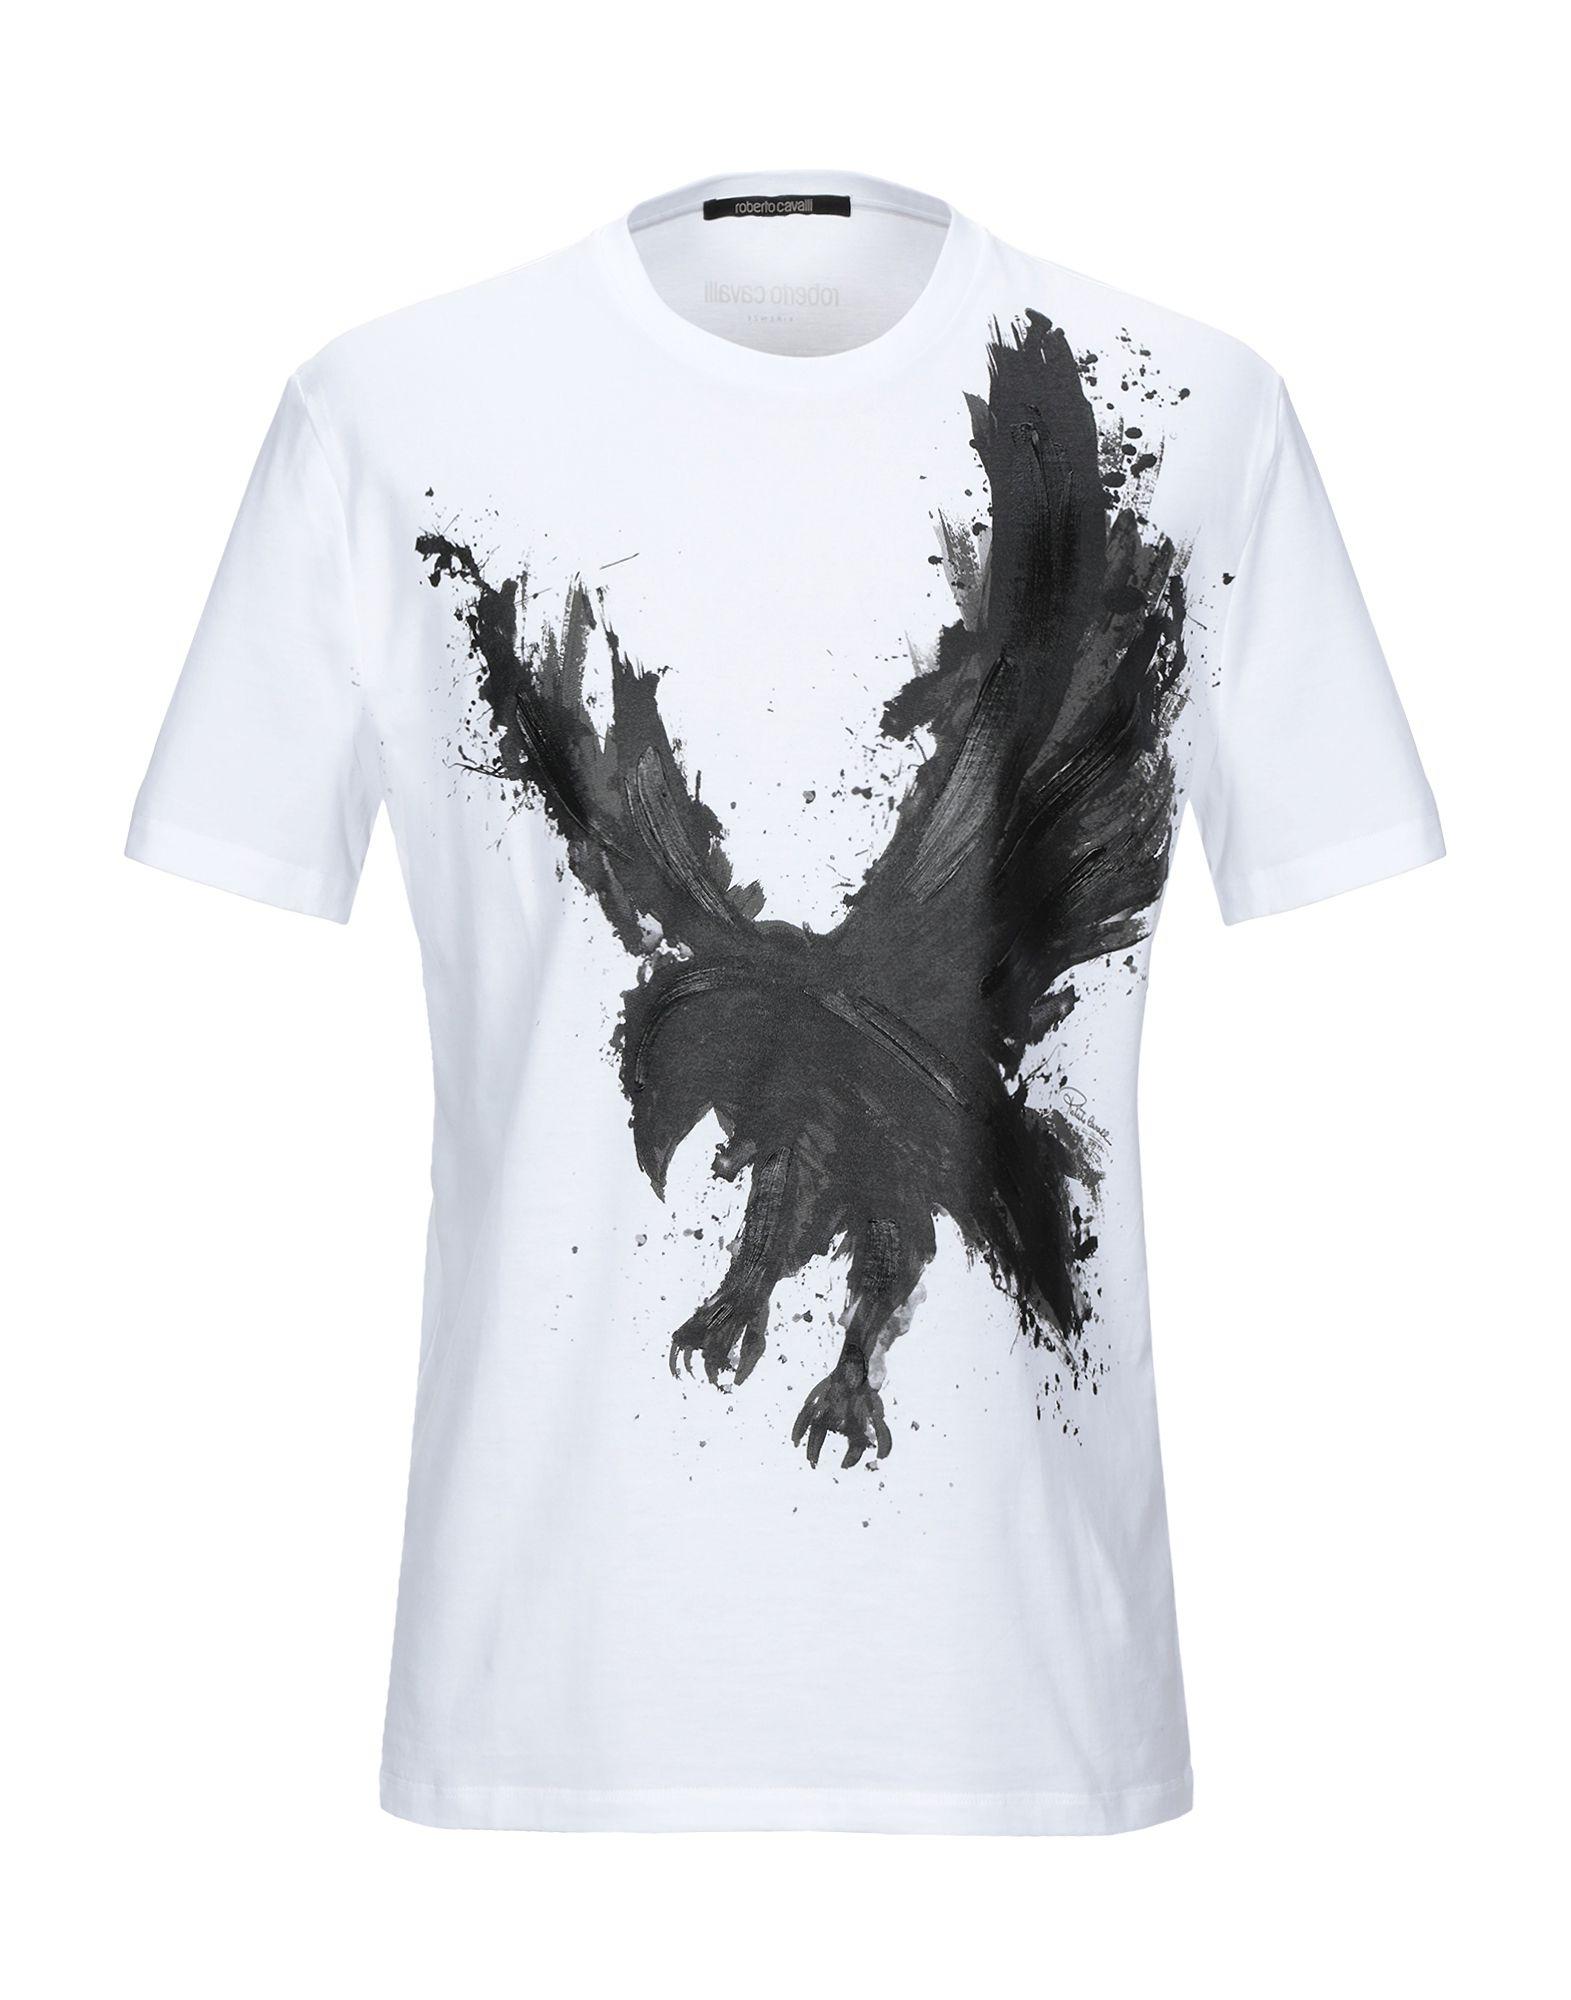 T-Shirt Roberto Cavalli herren - 12330042WM